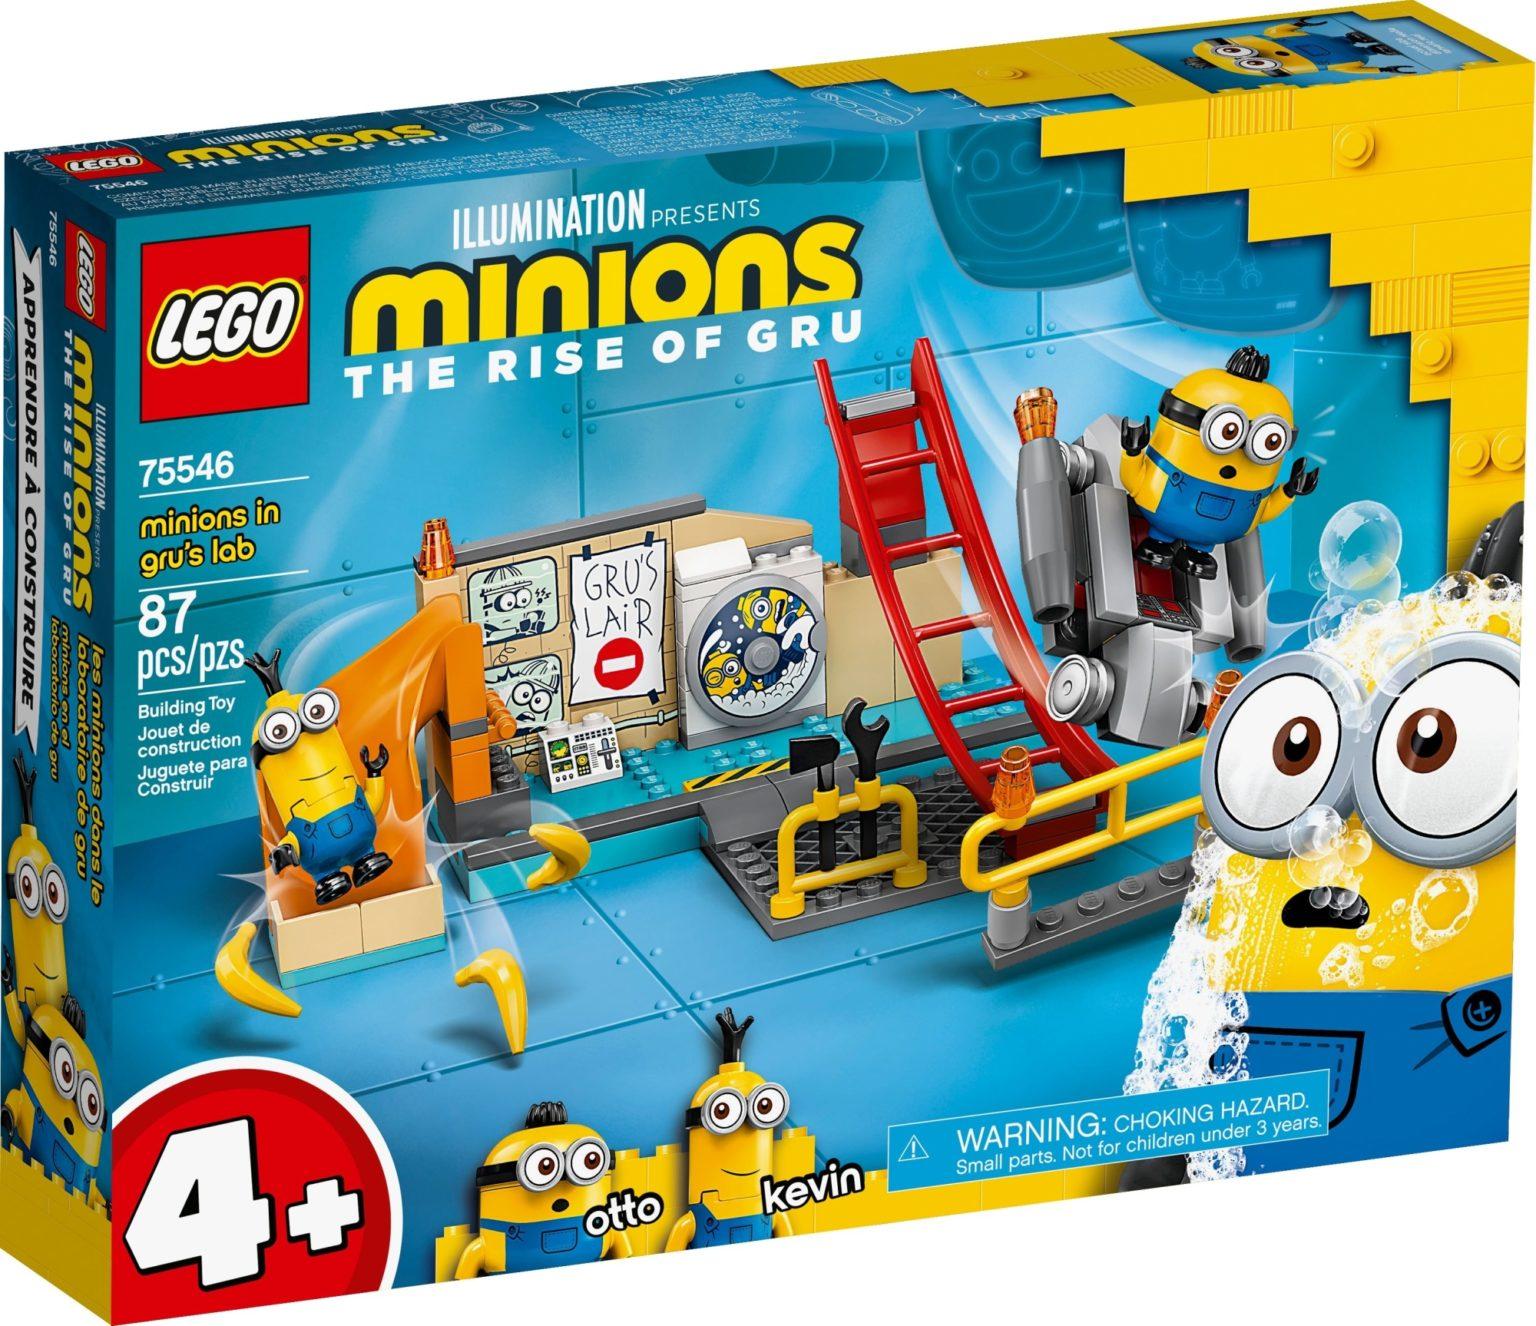 LEGO_75546_alt1